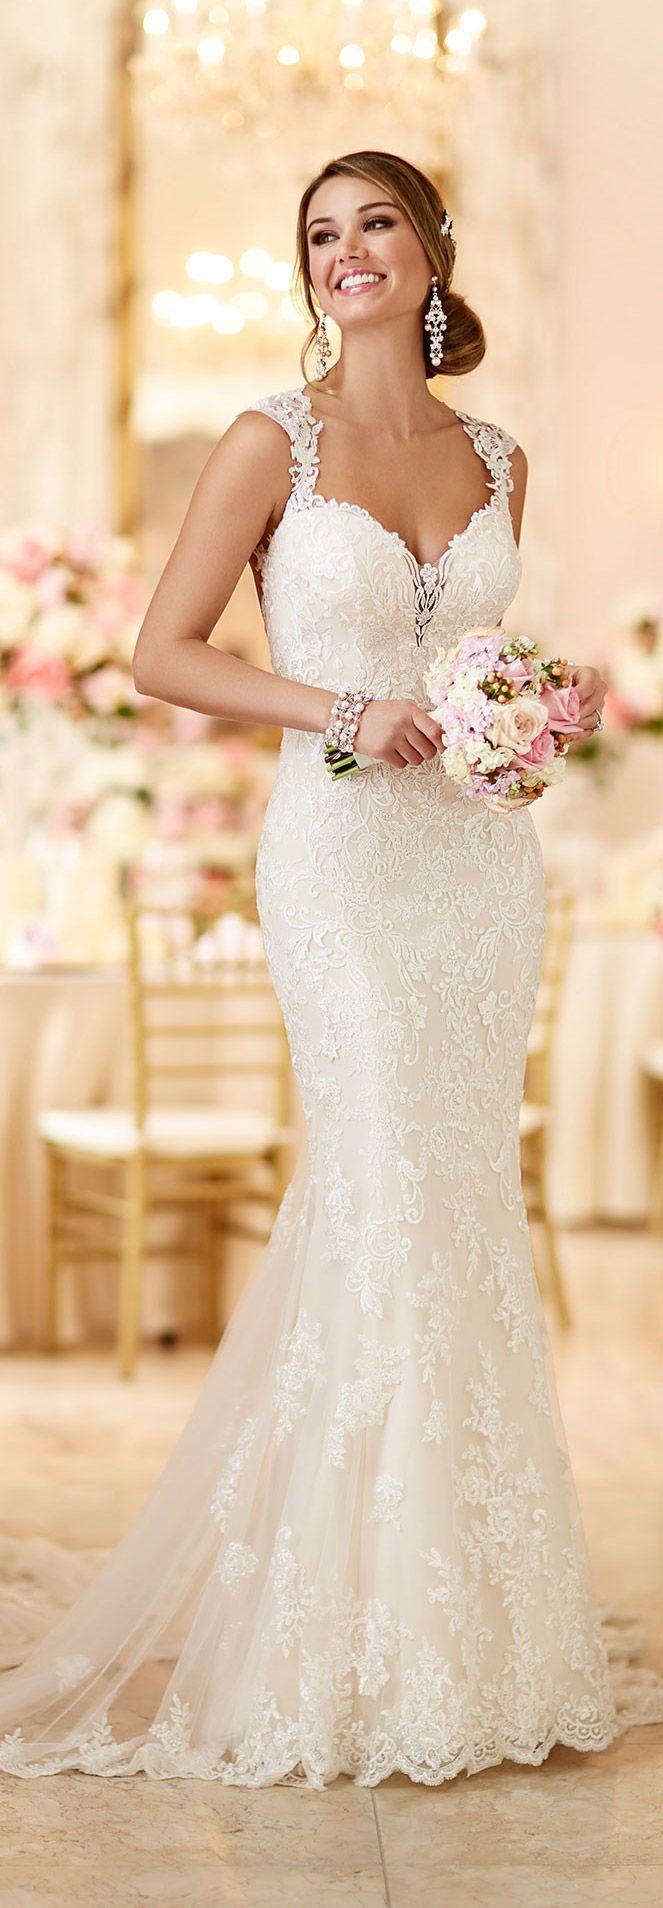 Mariage - Beautiful Long Dress with Beads